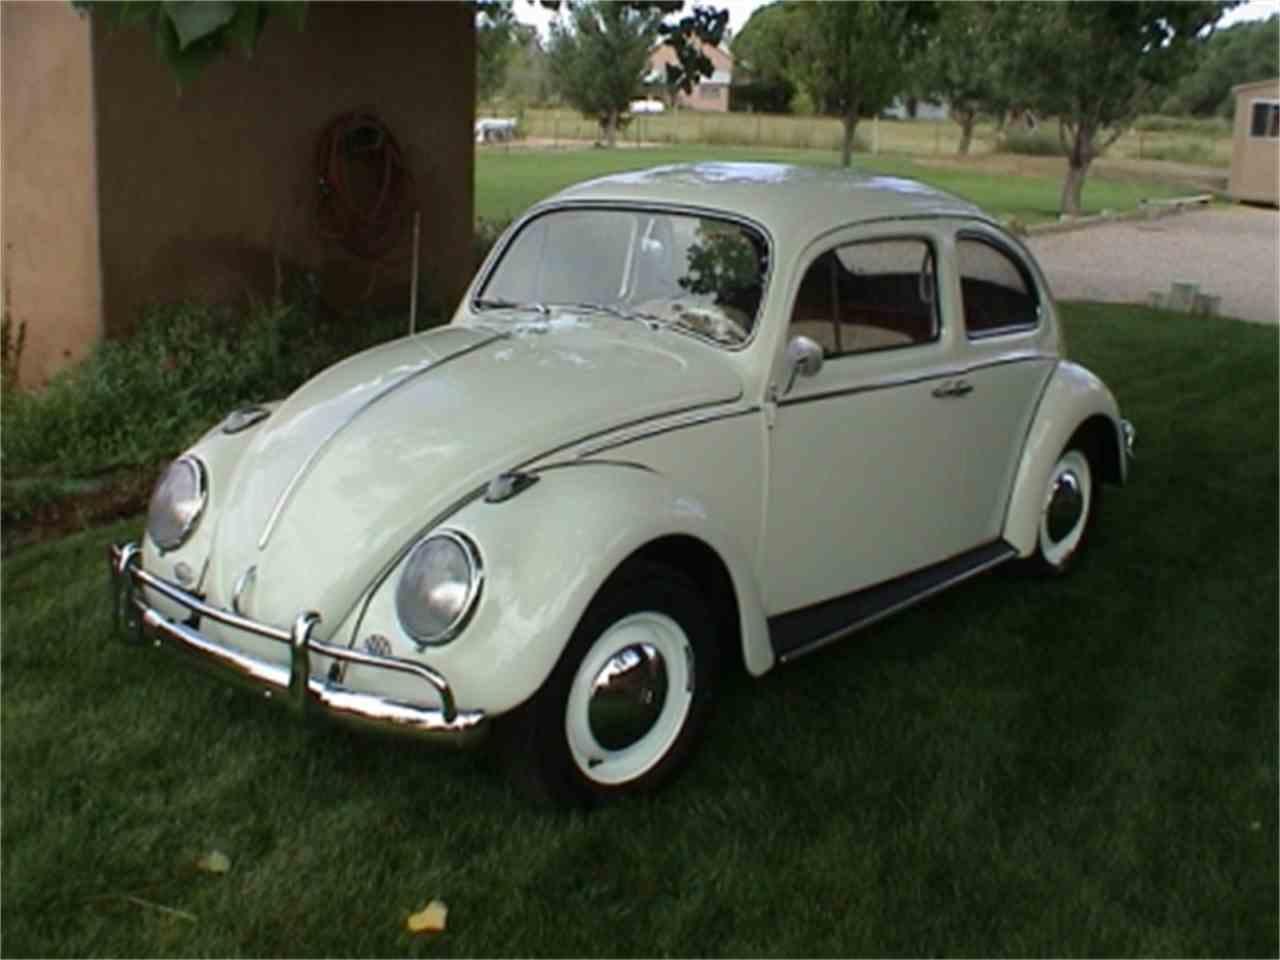 1963 Volkswagen Beetle For Sale Classiccars Com Cc 577252